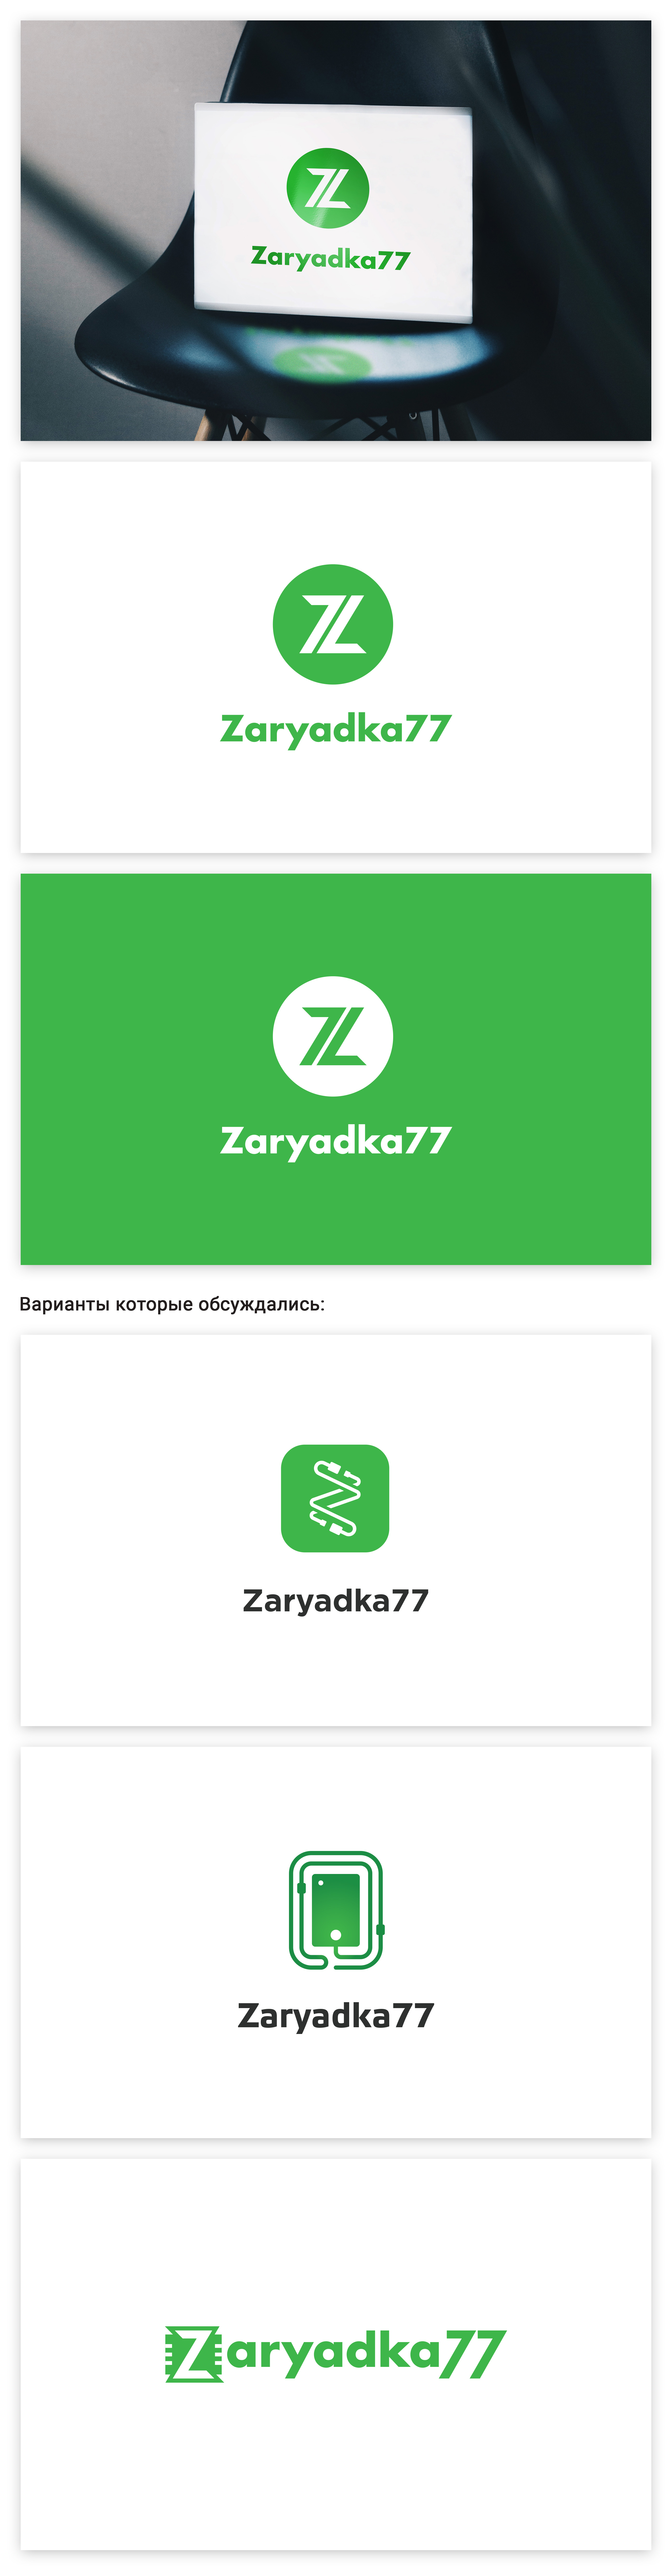 "Разработка логотипа для компании ""Zaryadka77"""